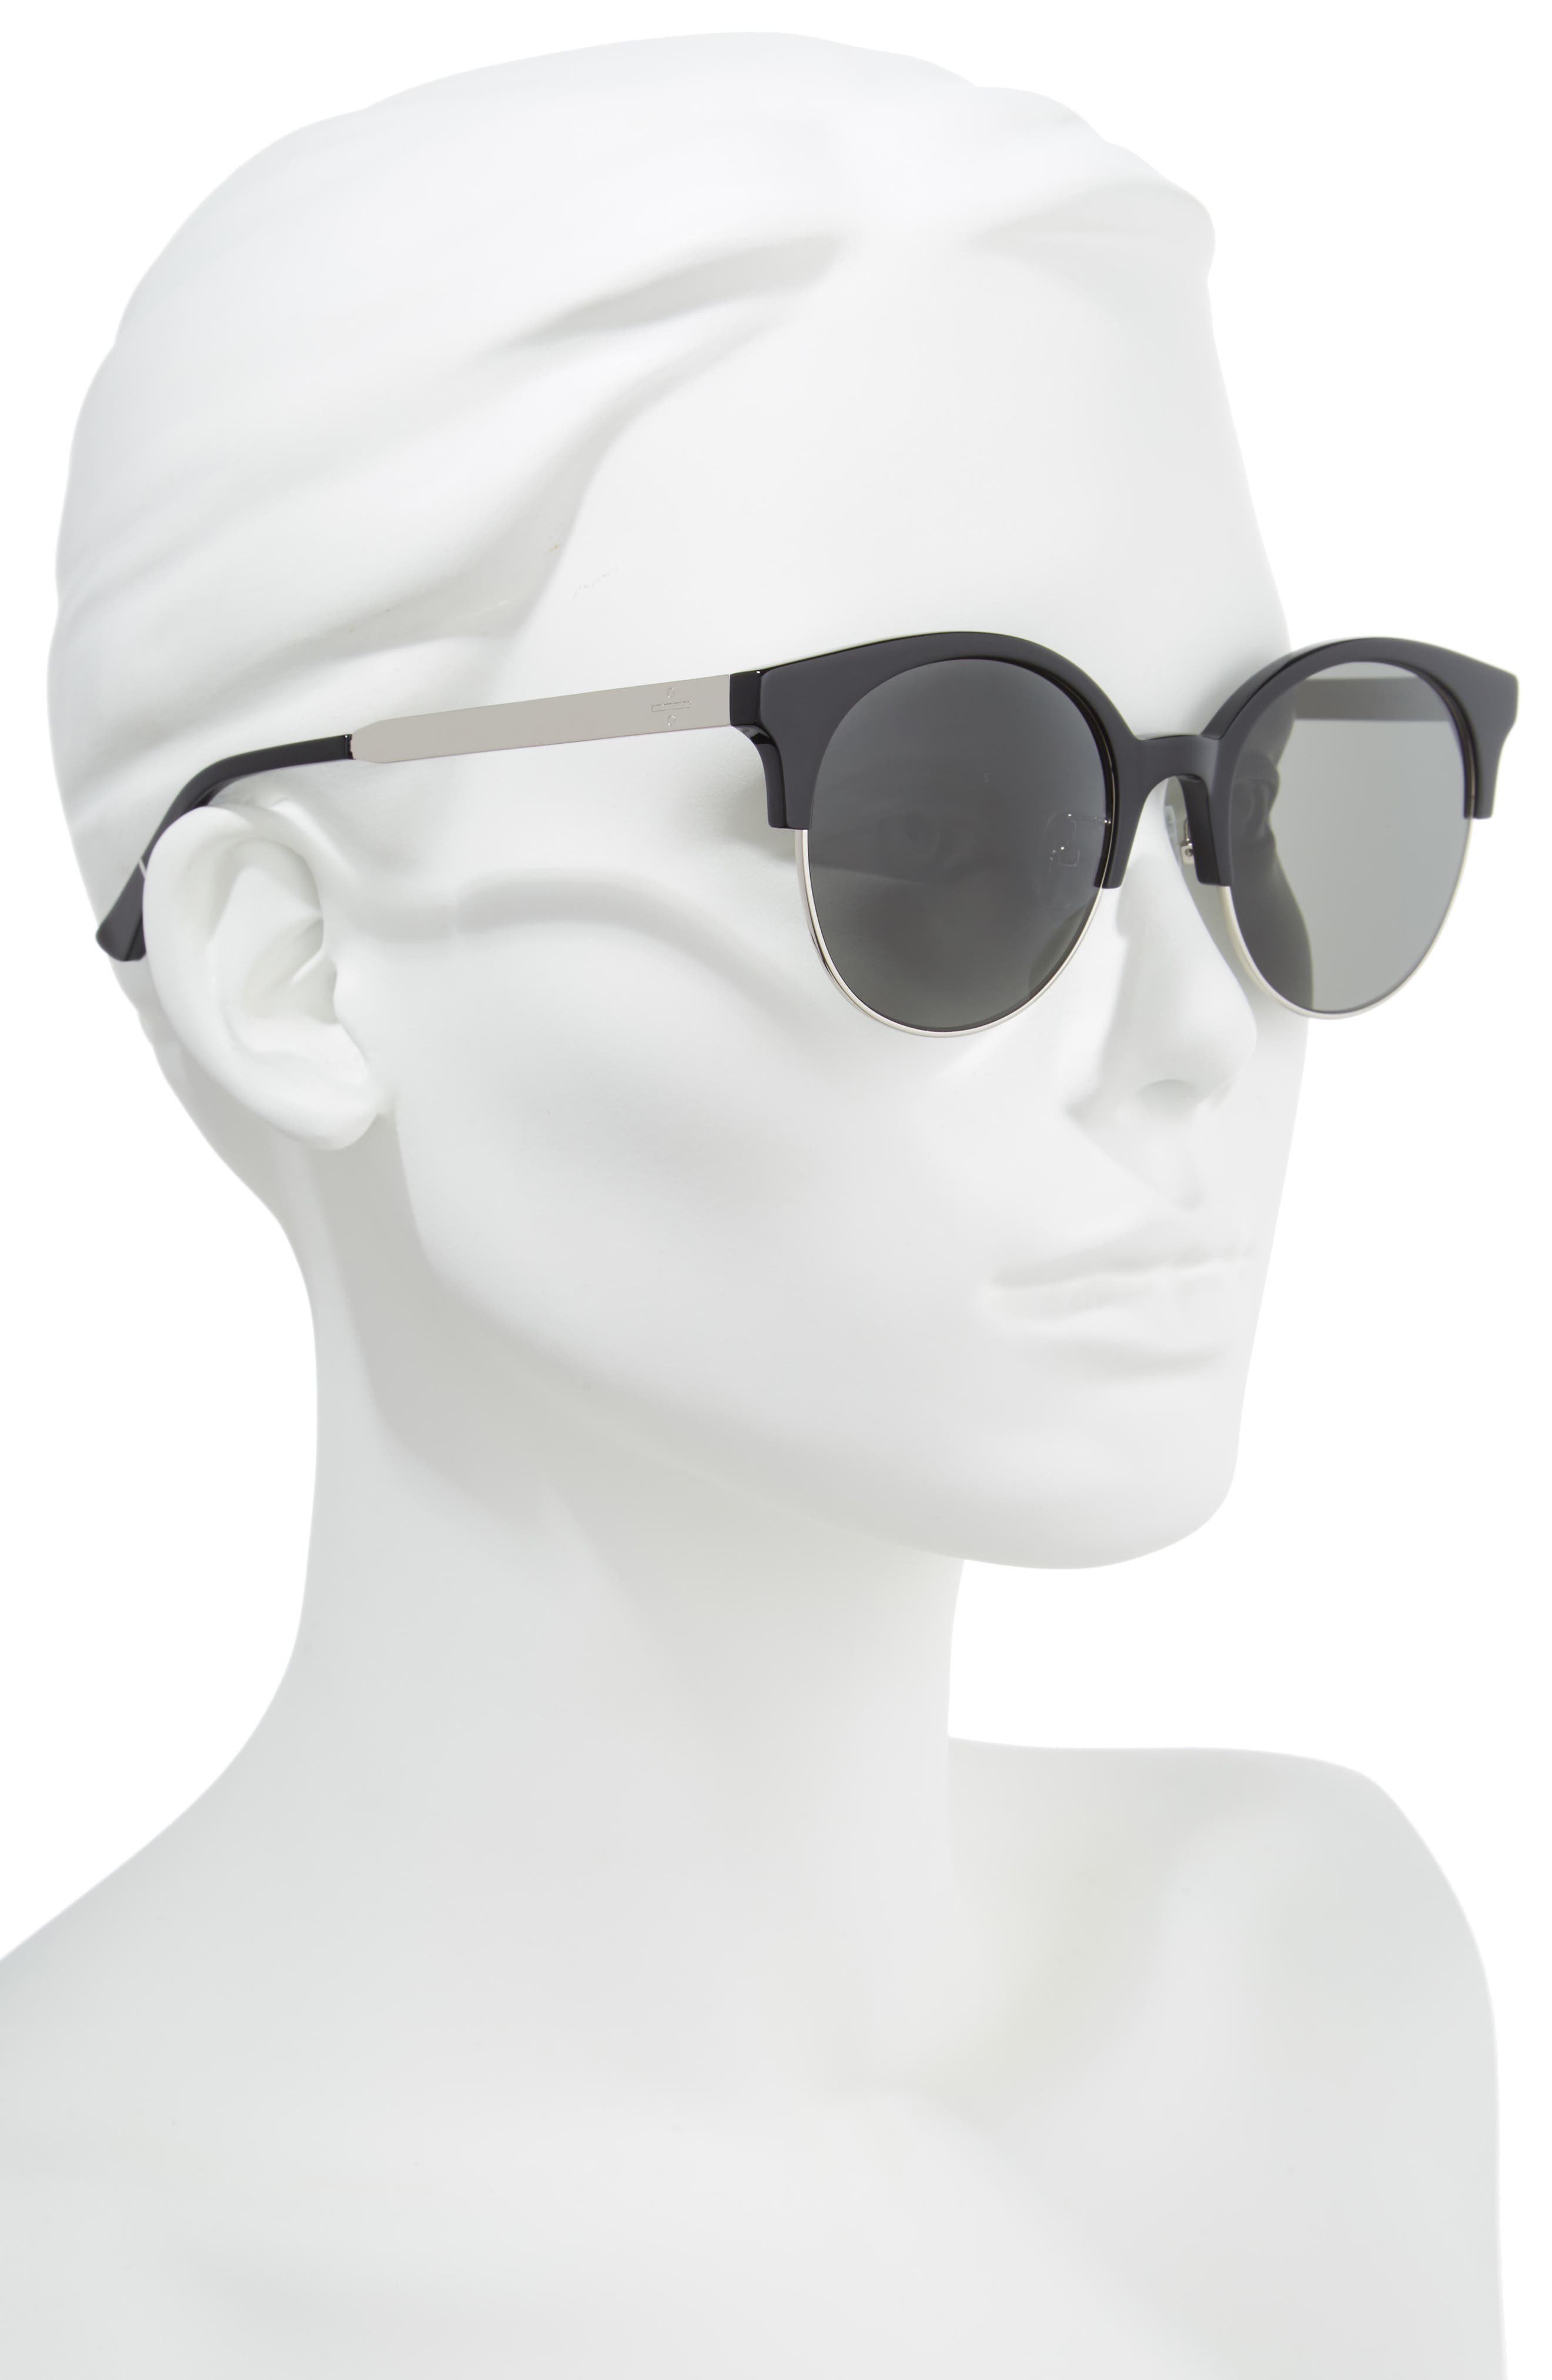 BLANC & ECLARE Venice Round Sunglasses,                             Alternate thumbnail 3, color,